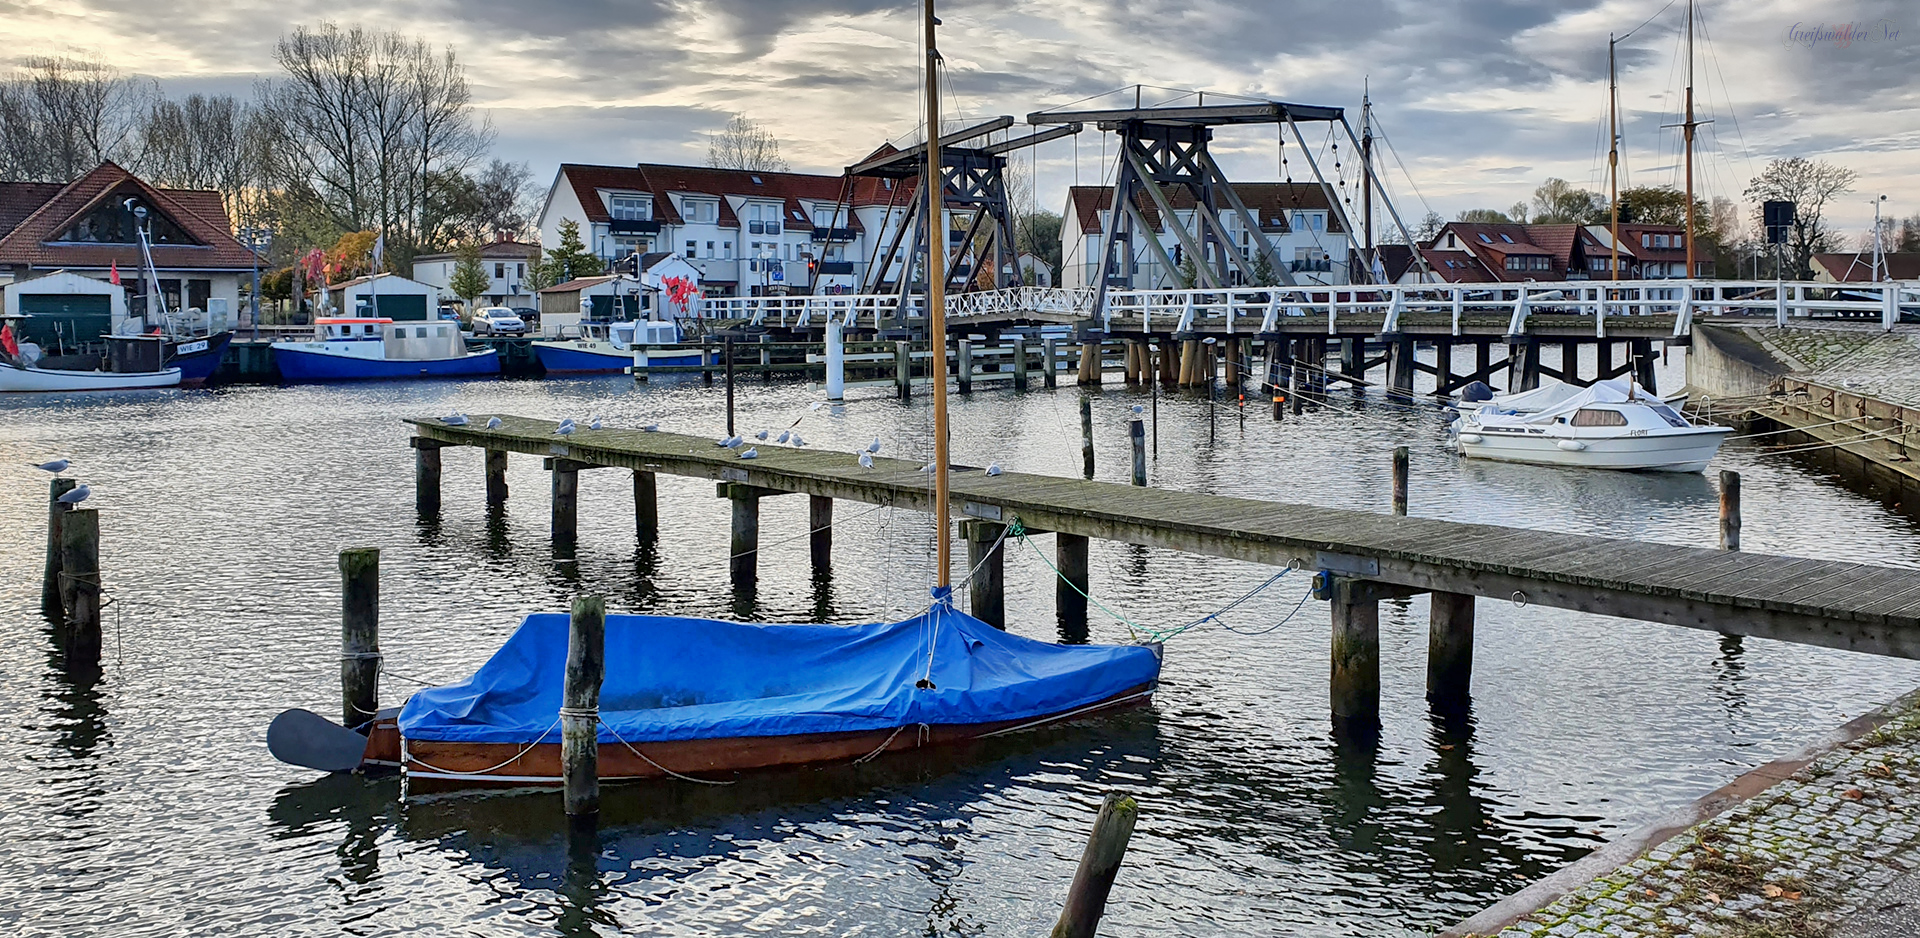 Herbst an der Holzklappbrücke in Greifswald-Wieck